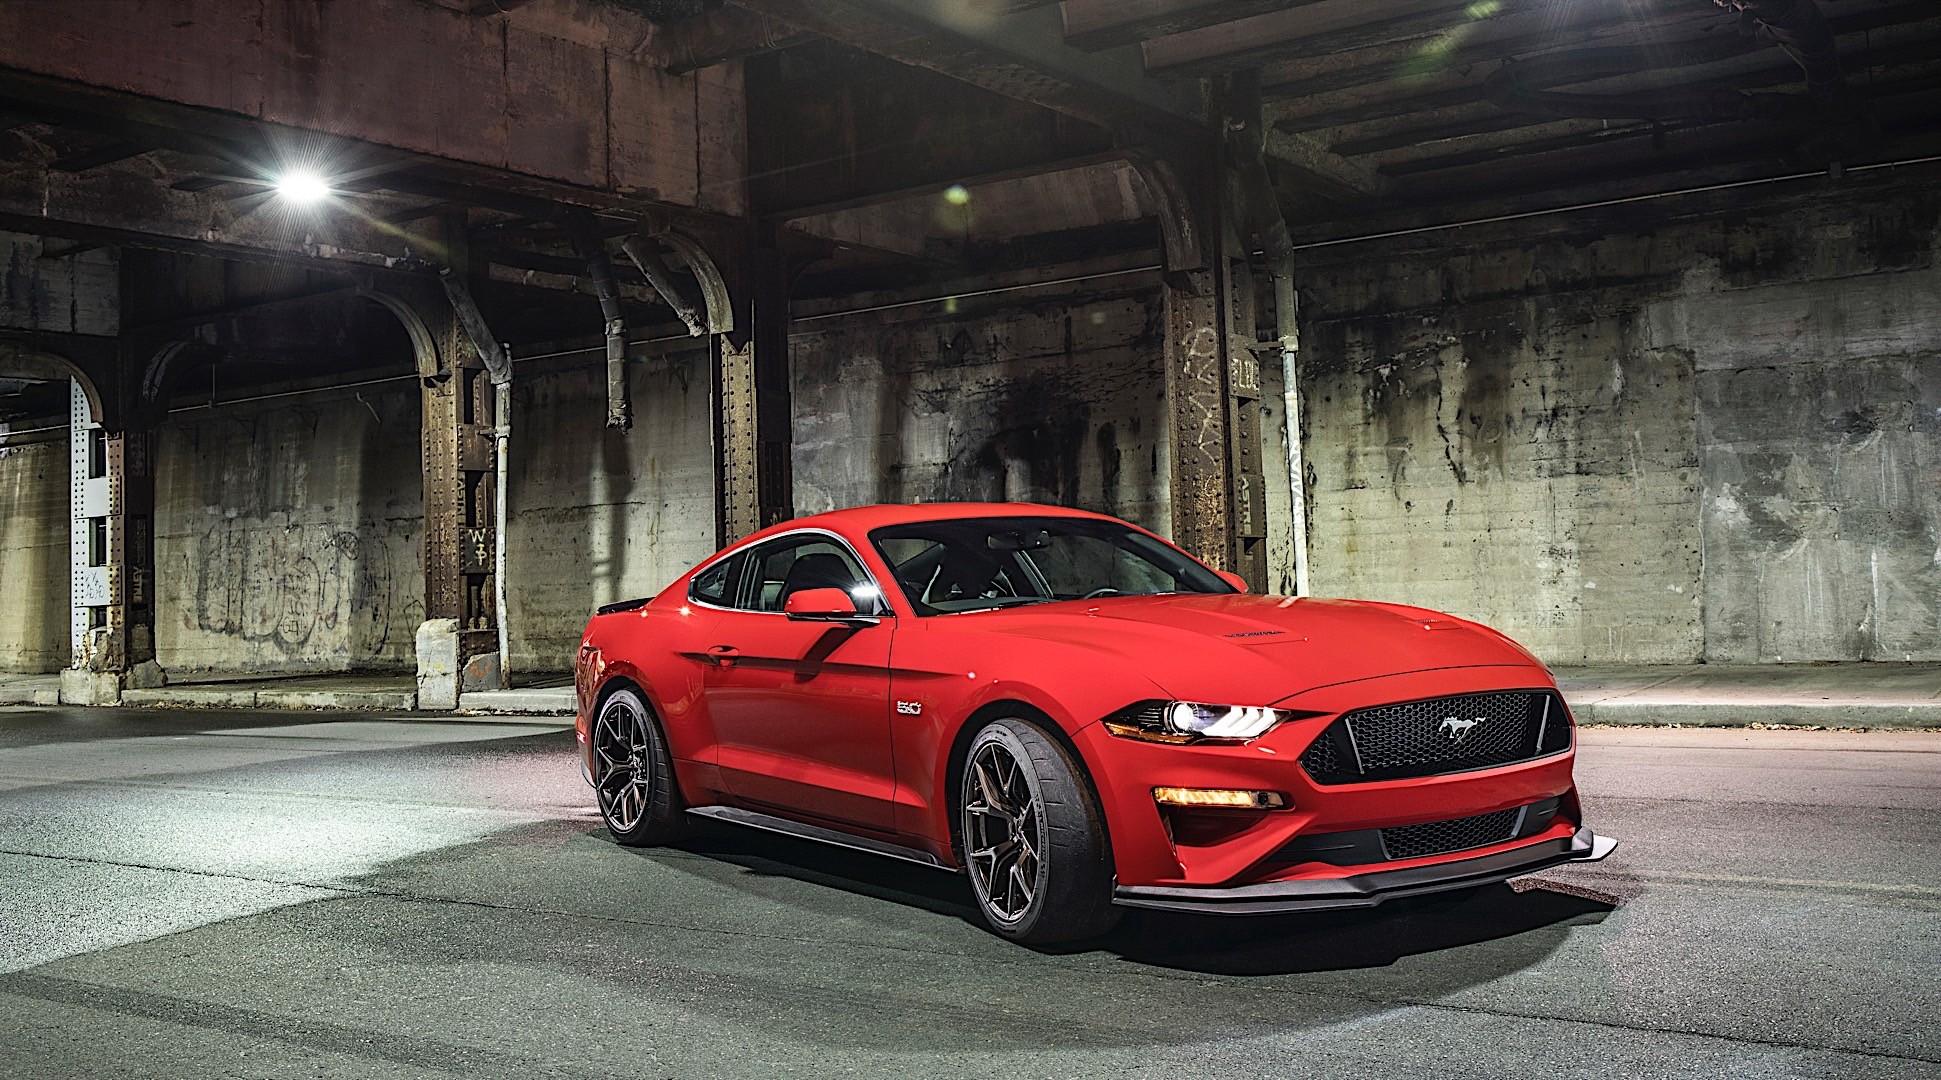 2018 Mustang Gt500 >> FORD Mustang specs & photos - 2017, 2018, 2019 - autoevolution